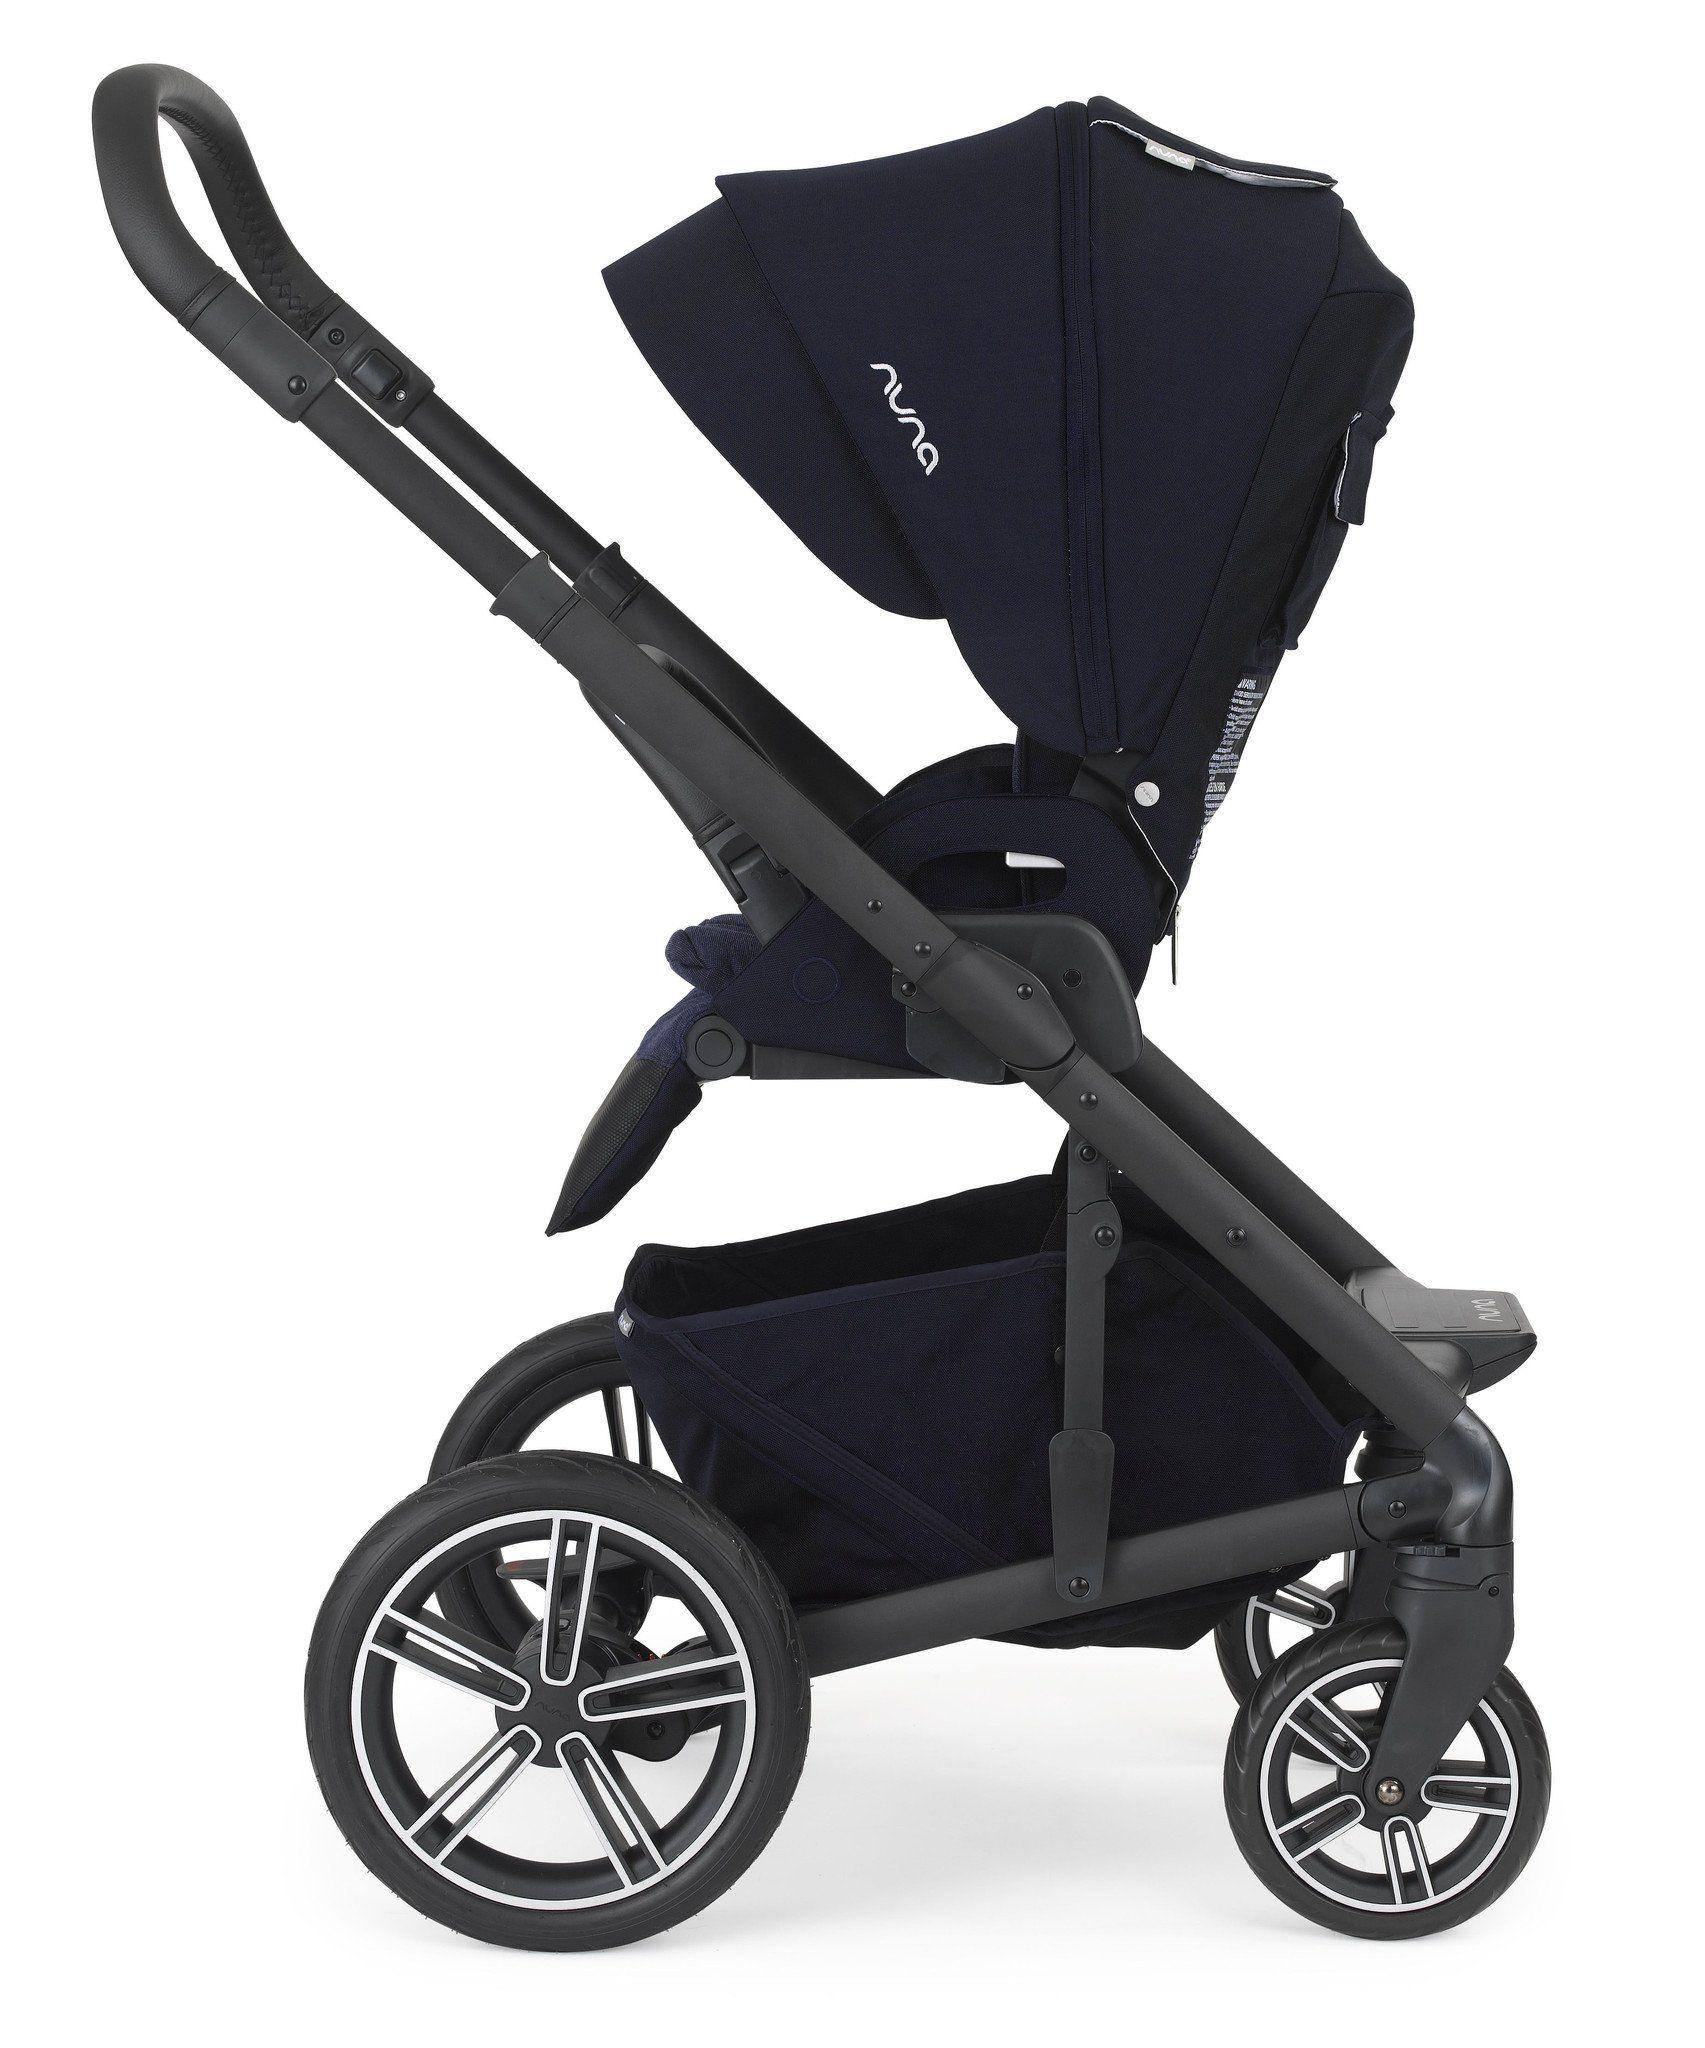 Nuna mixx 2 stroller floor model with images stroller